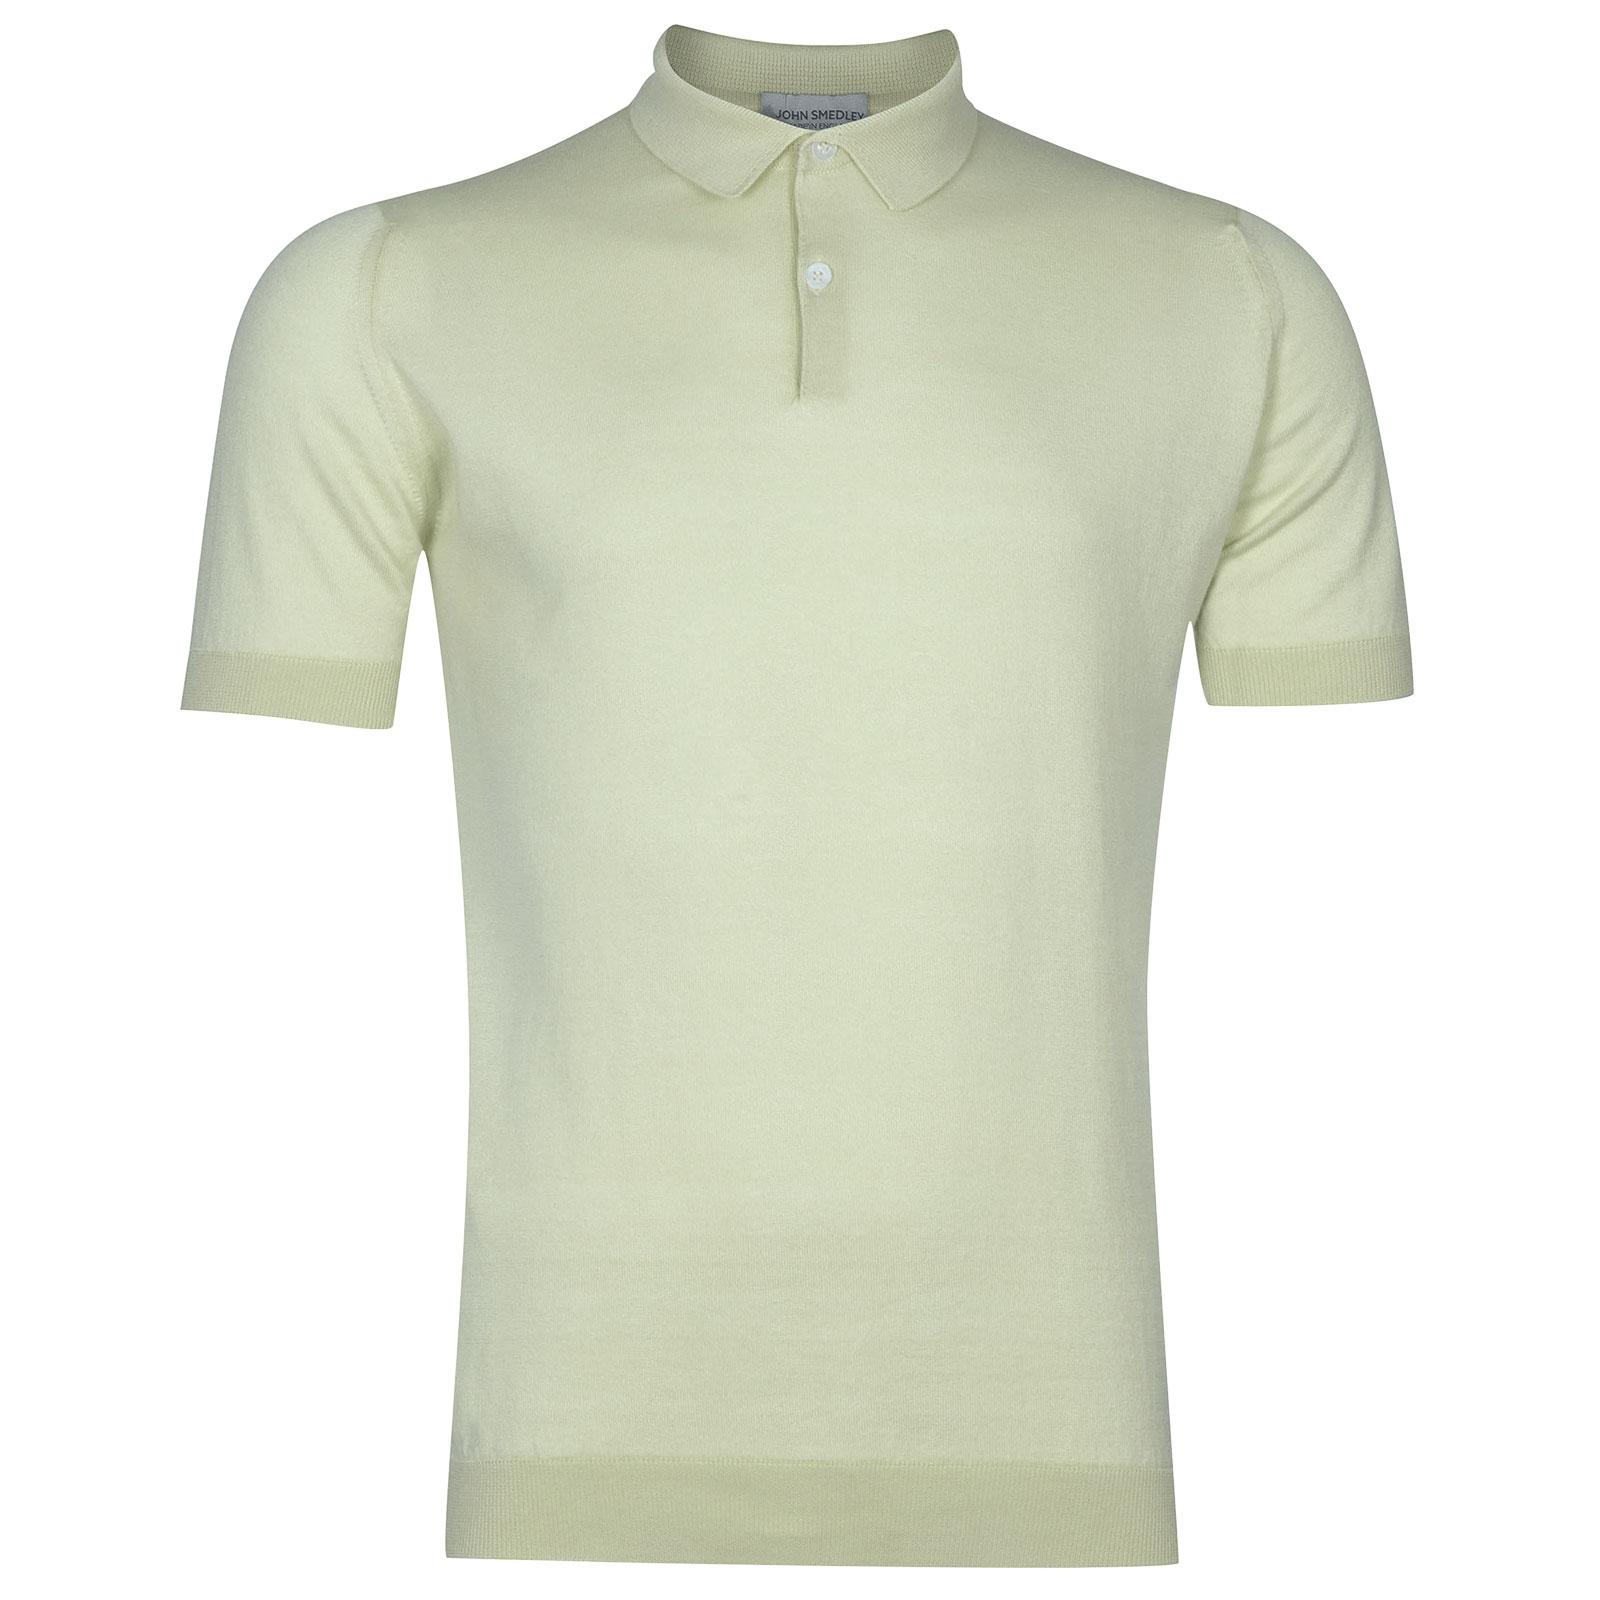 John Smedley Rhodes in Bud Green Shirt-SML